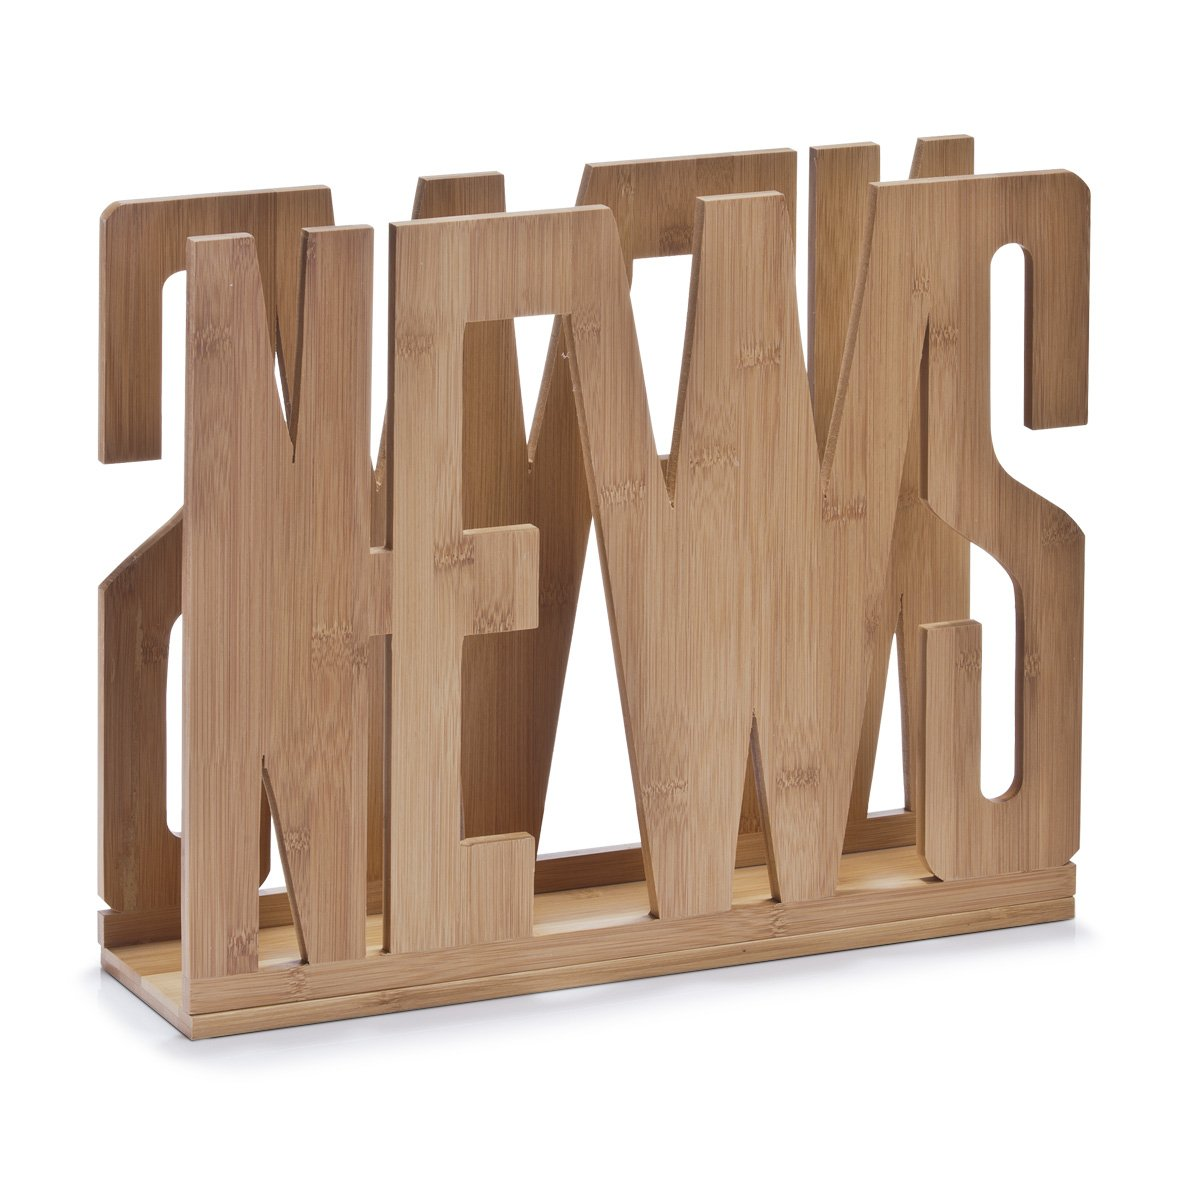 Zeller 13577 Portariviste News in bambù, 42 x 11 x 33 cm